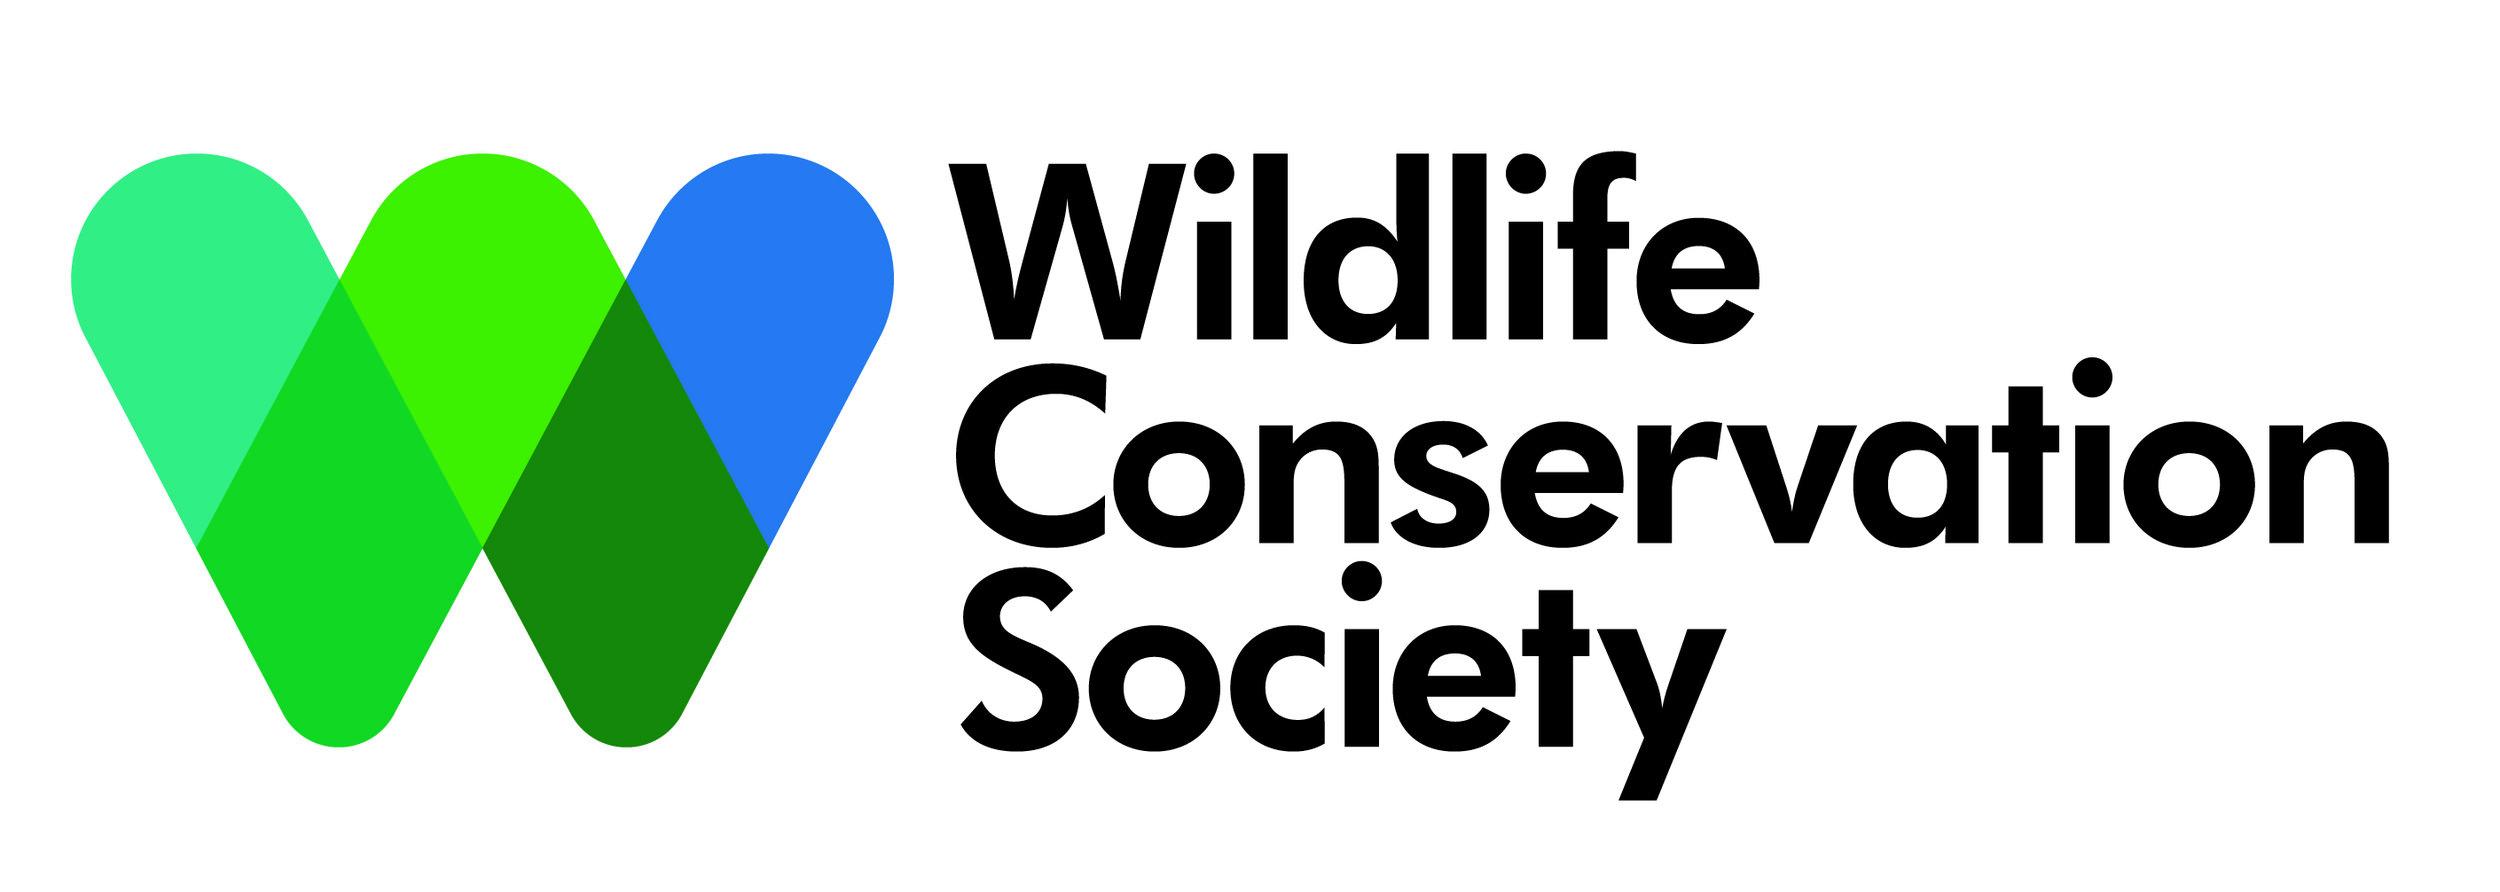 wildlife cons .jpg